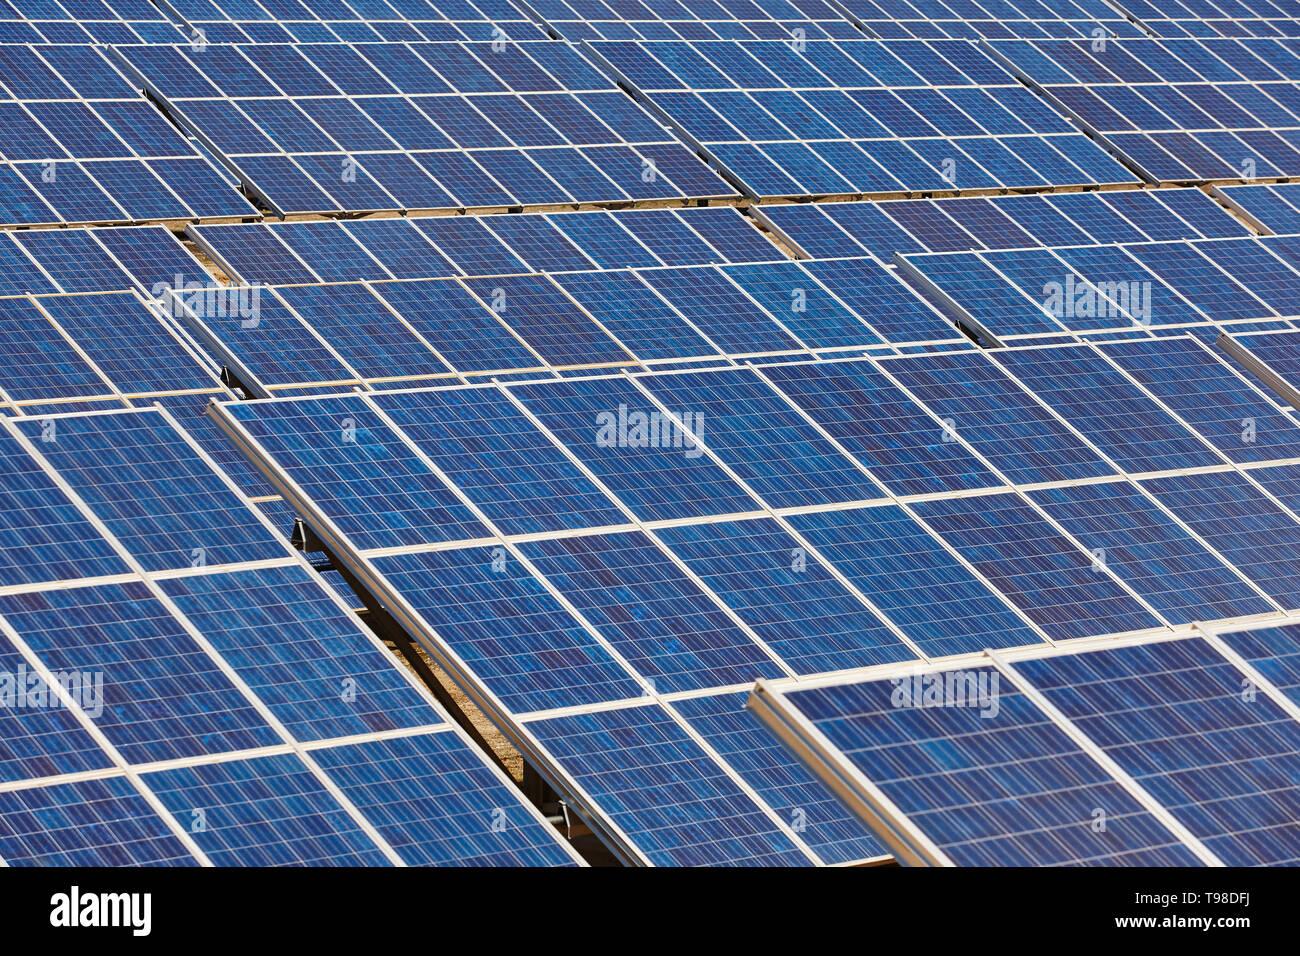 Solar panel plant. Sustainable renewable power energy and global warning - Stock Image